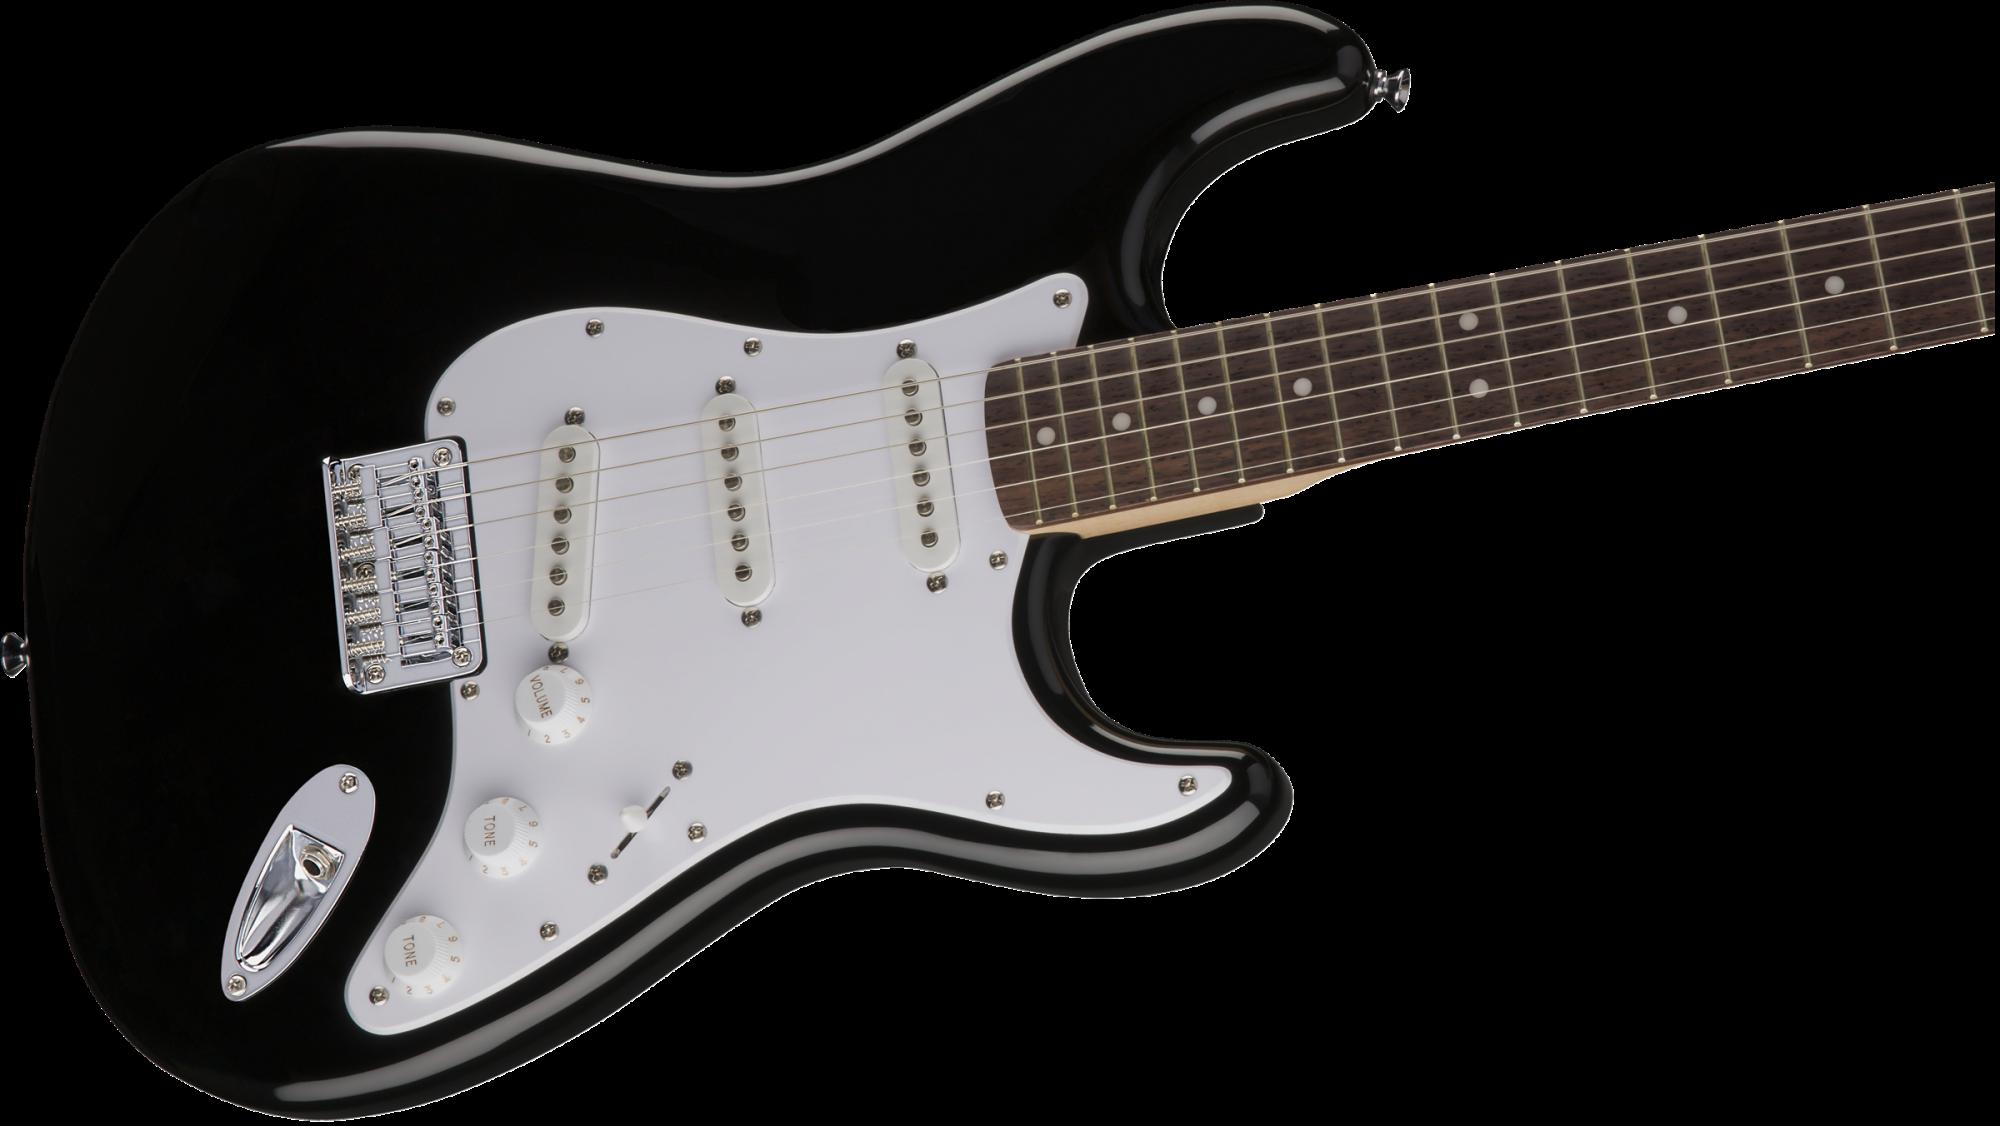 Squier Bullet Stratocaster HT - Black